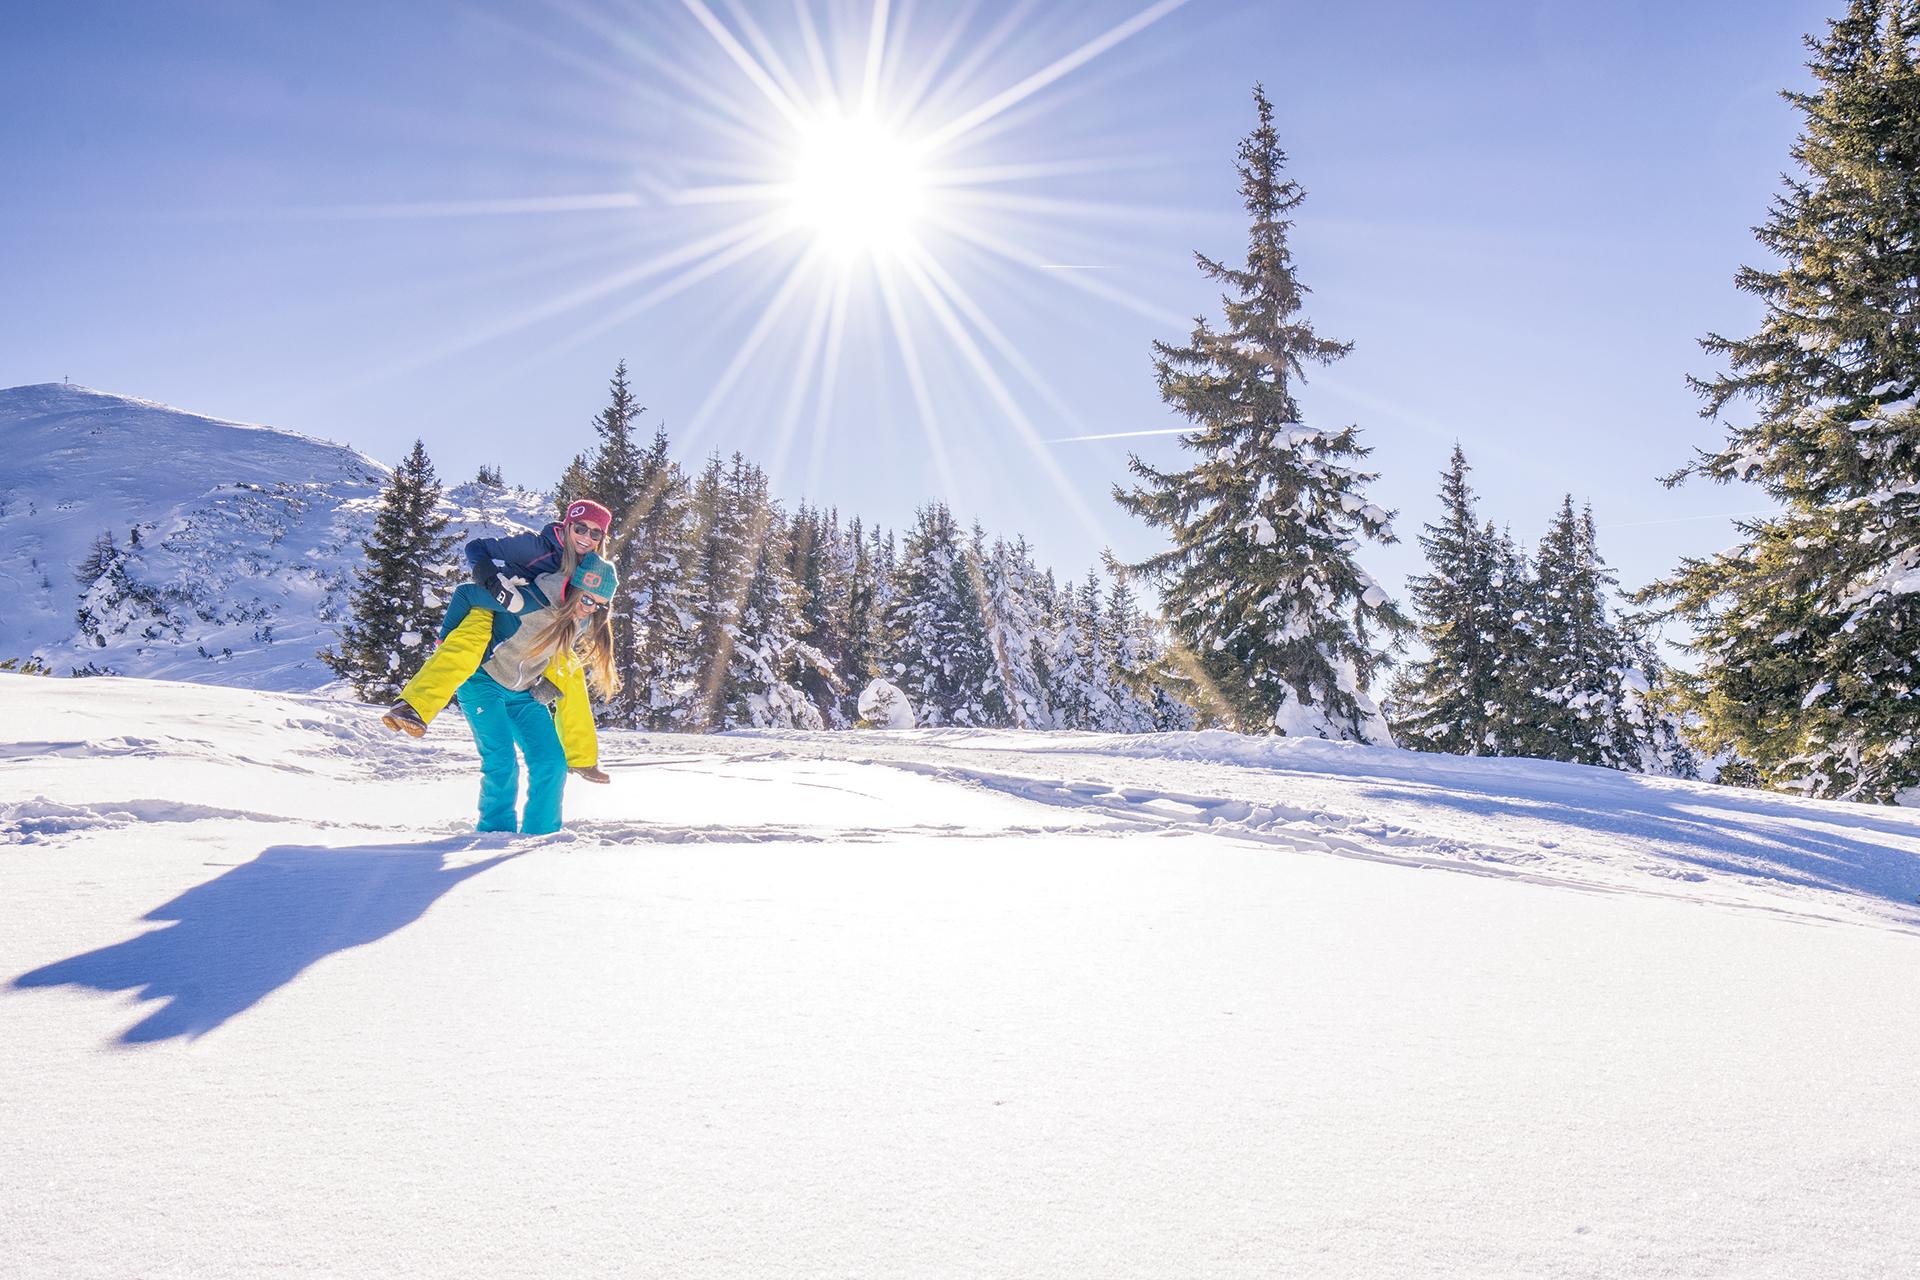 The Burgfellnerhof - Hochwurzen - snow pleasure